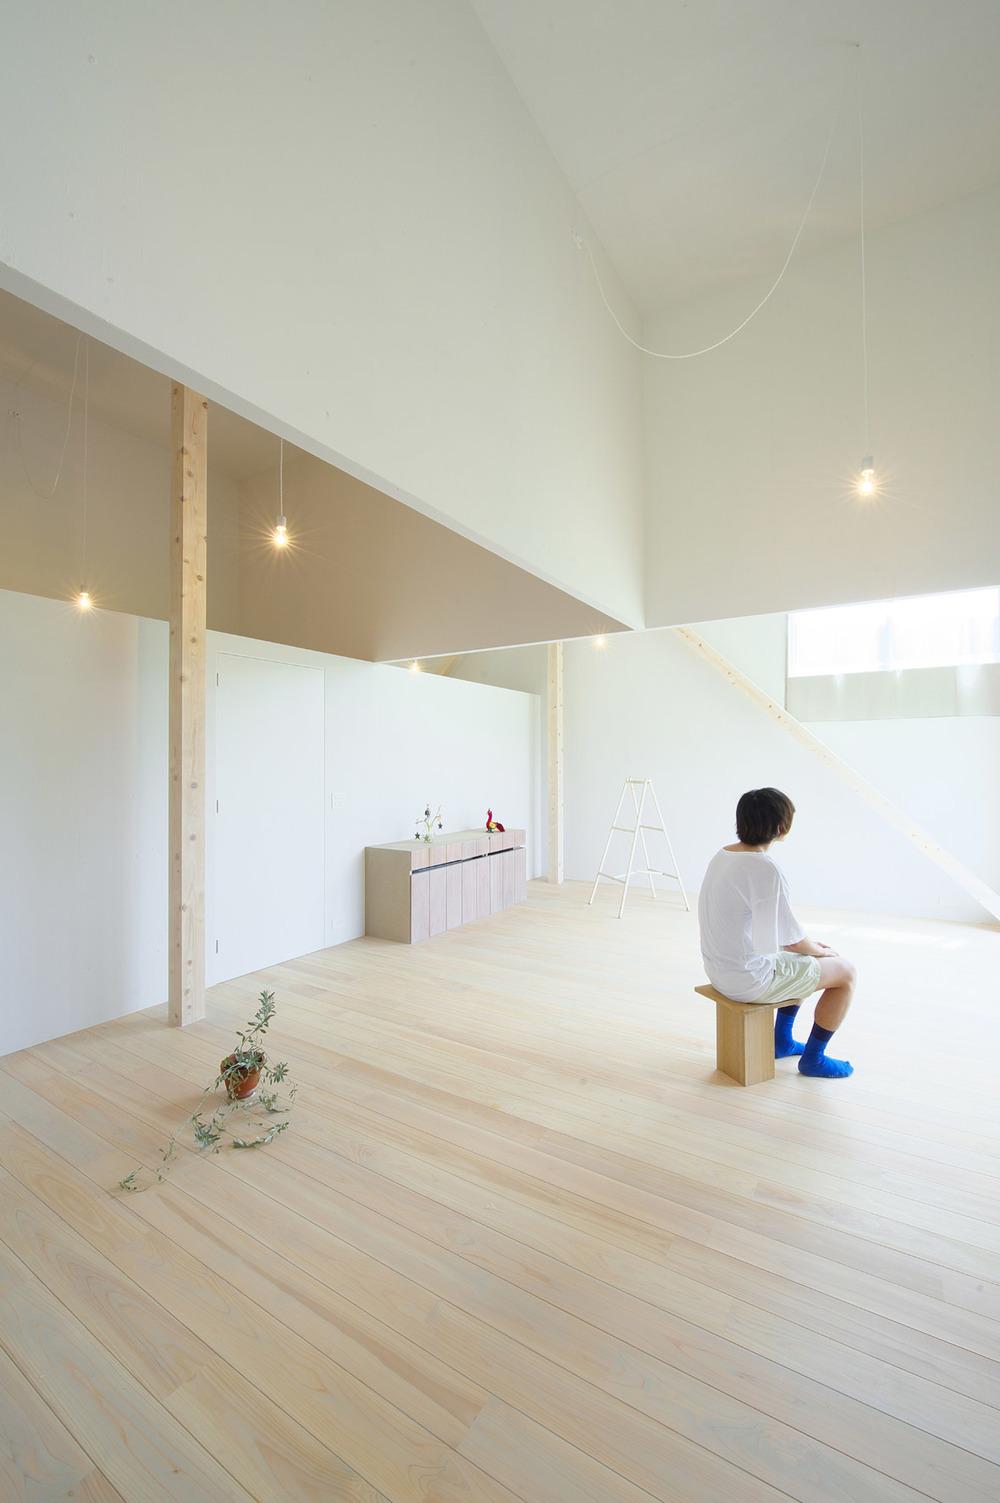 the-tree-mag_4-house-by-kimura-matsumoto_40.jpg